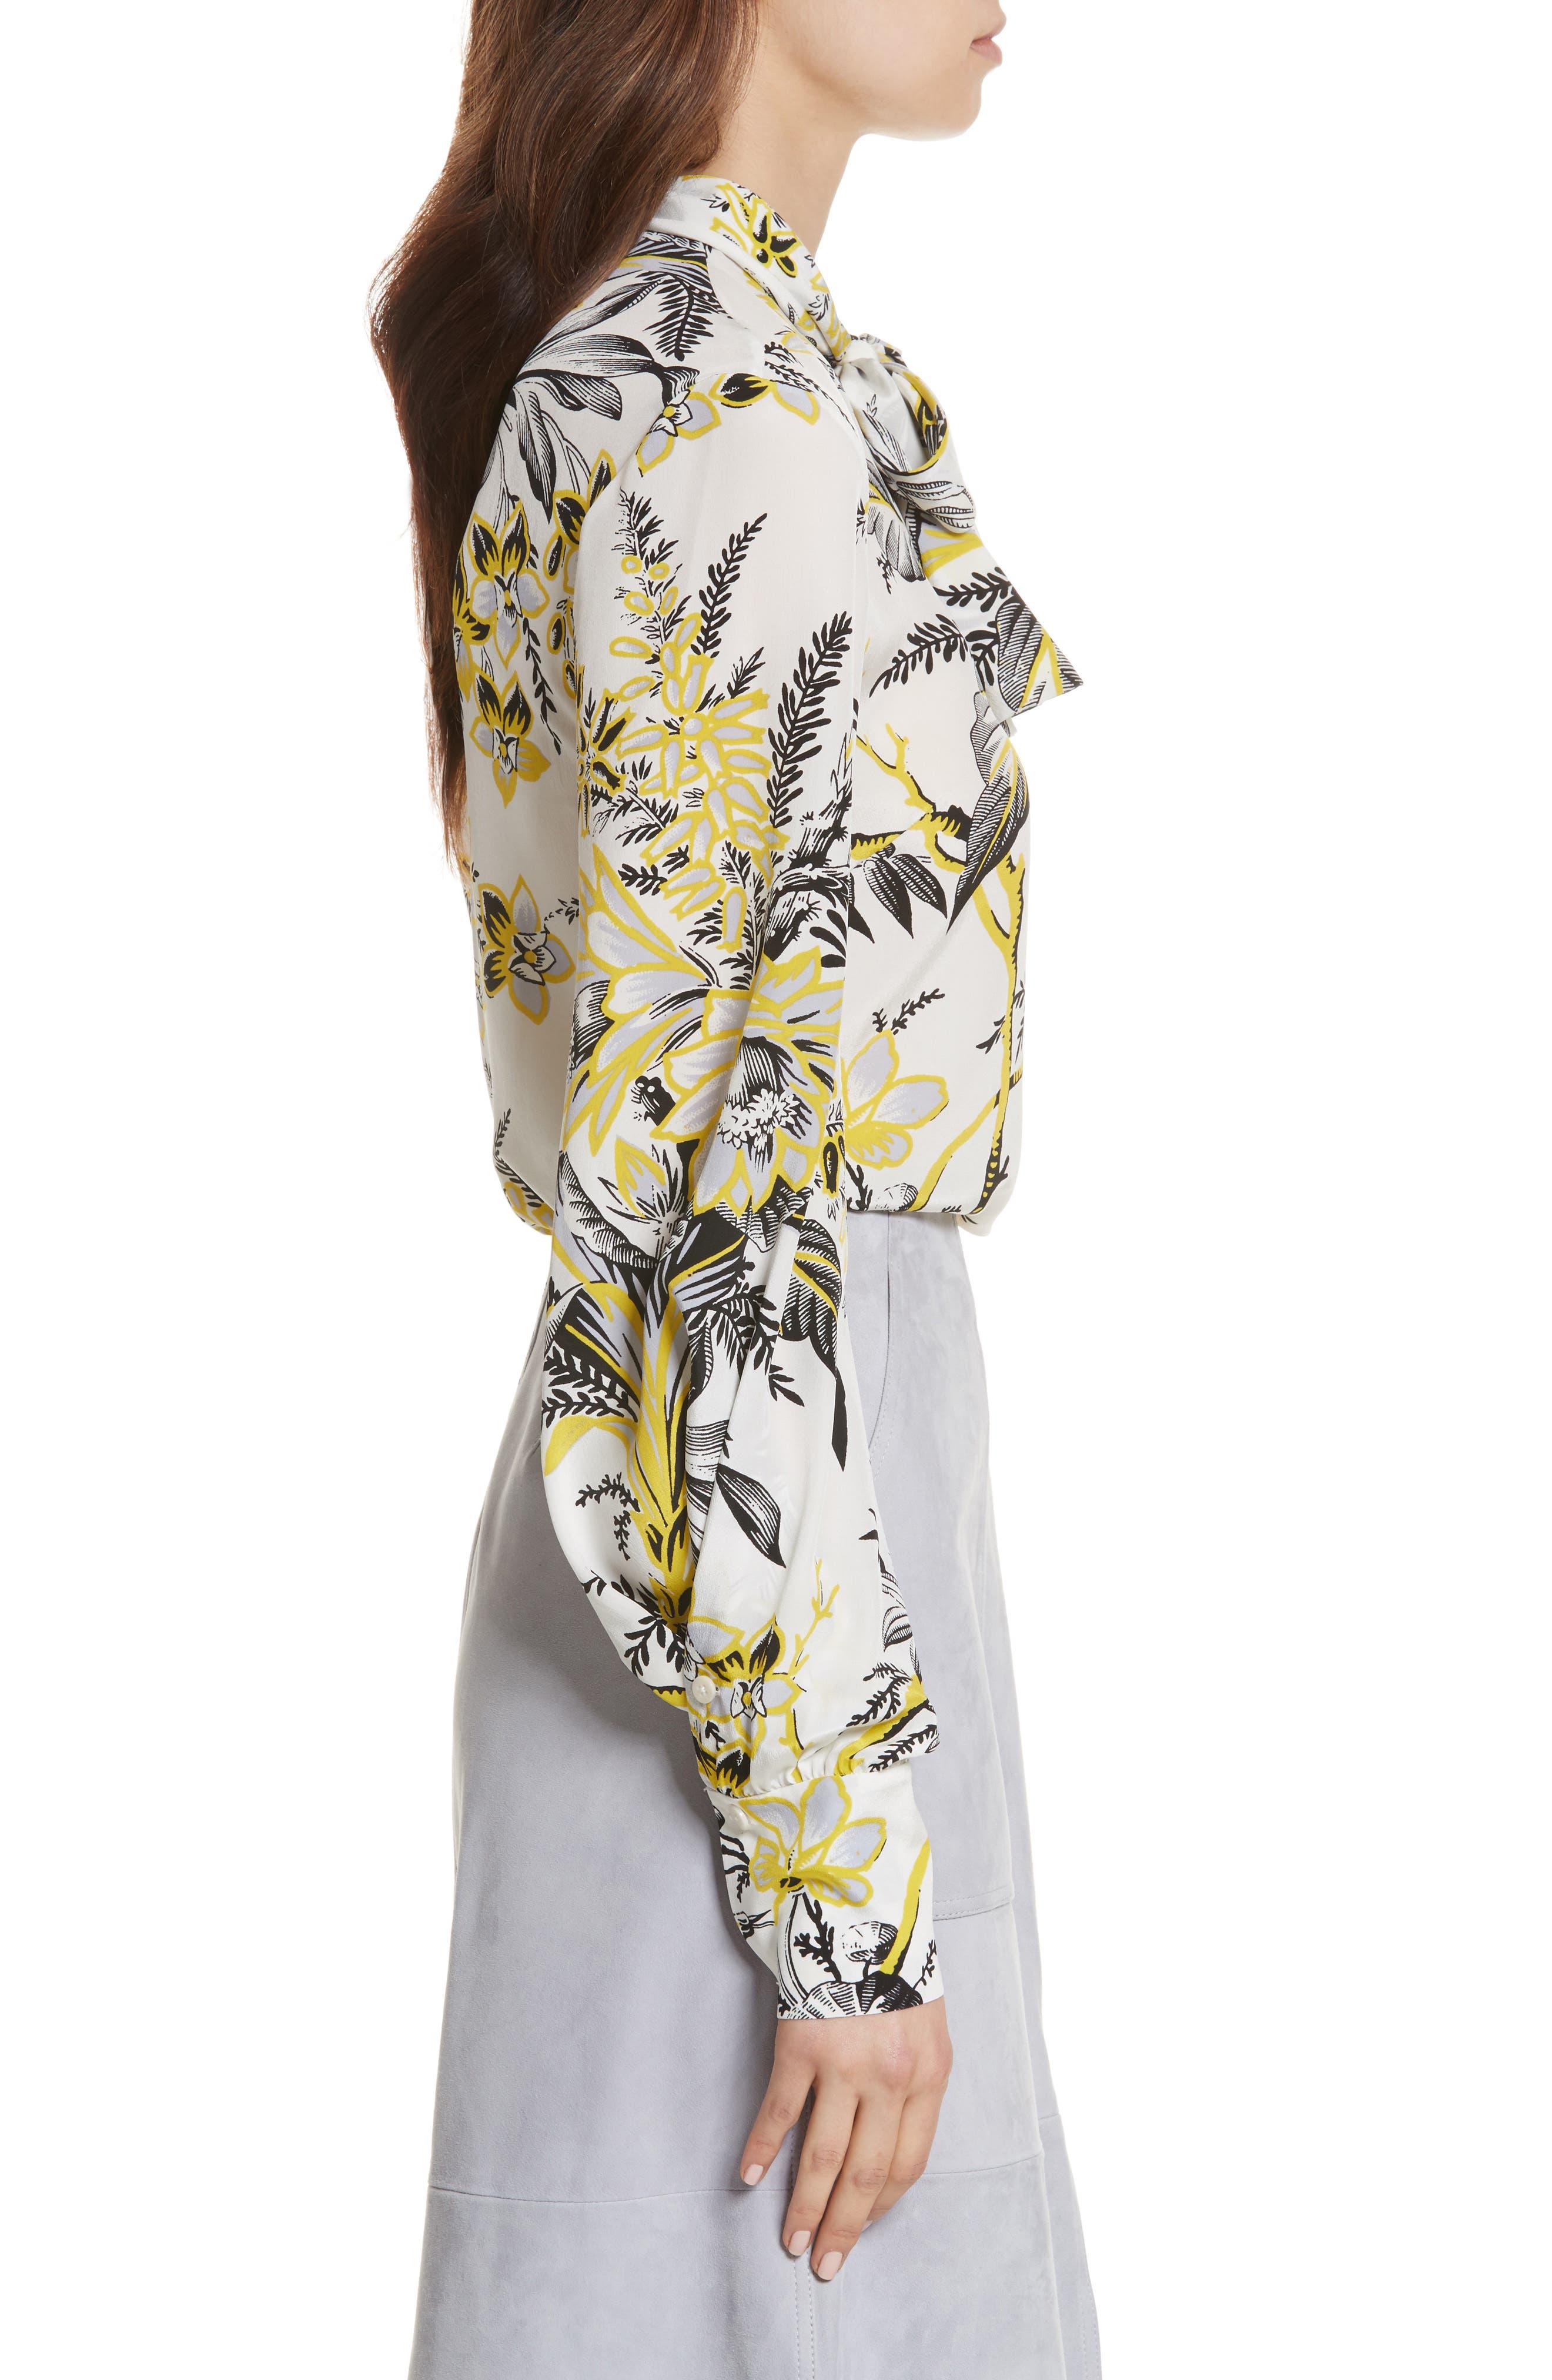 Diane von Furstenberg Tie Neck Silk Blouse,                             Alternate thumbnail 3, color,                             189